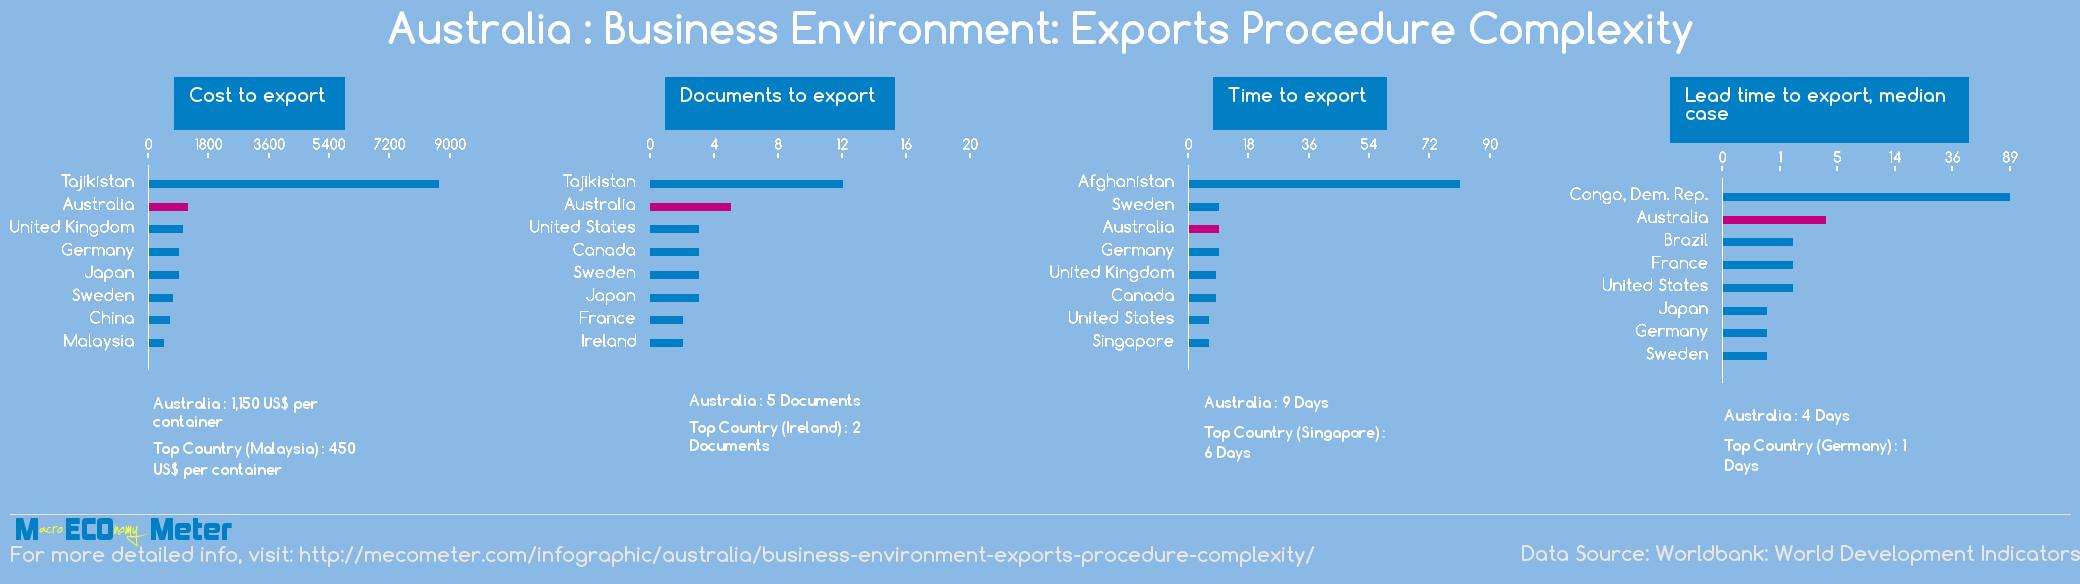 Australia : Business Environment: Exports Procedure Complexity